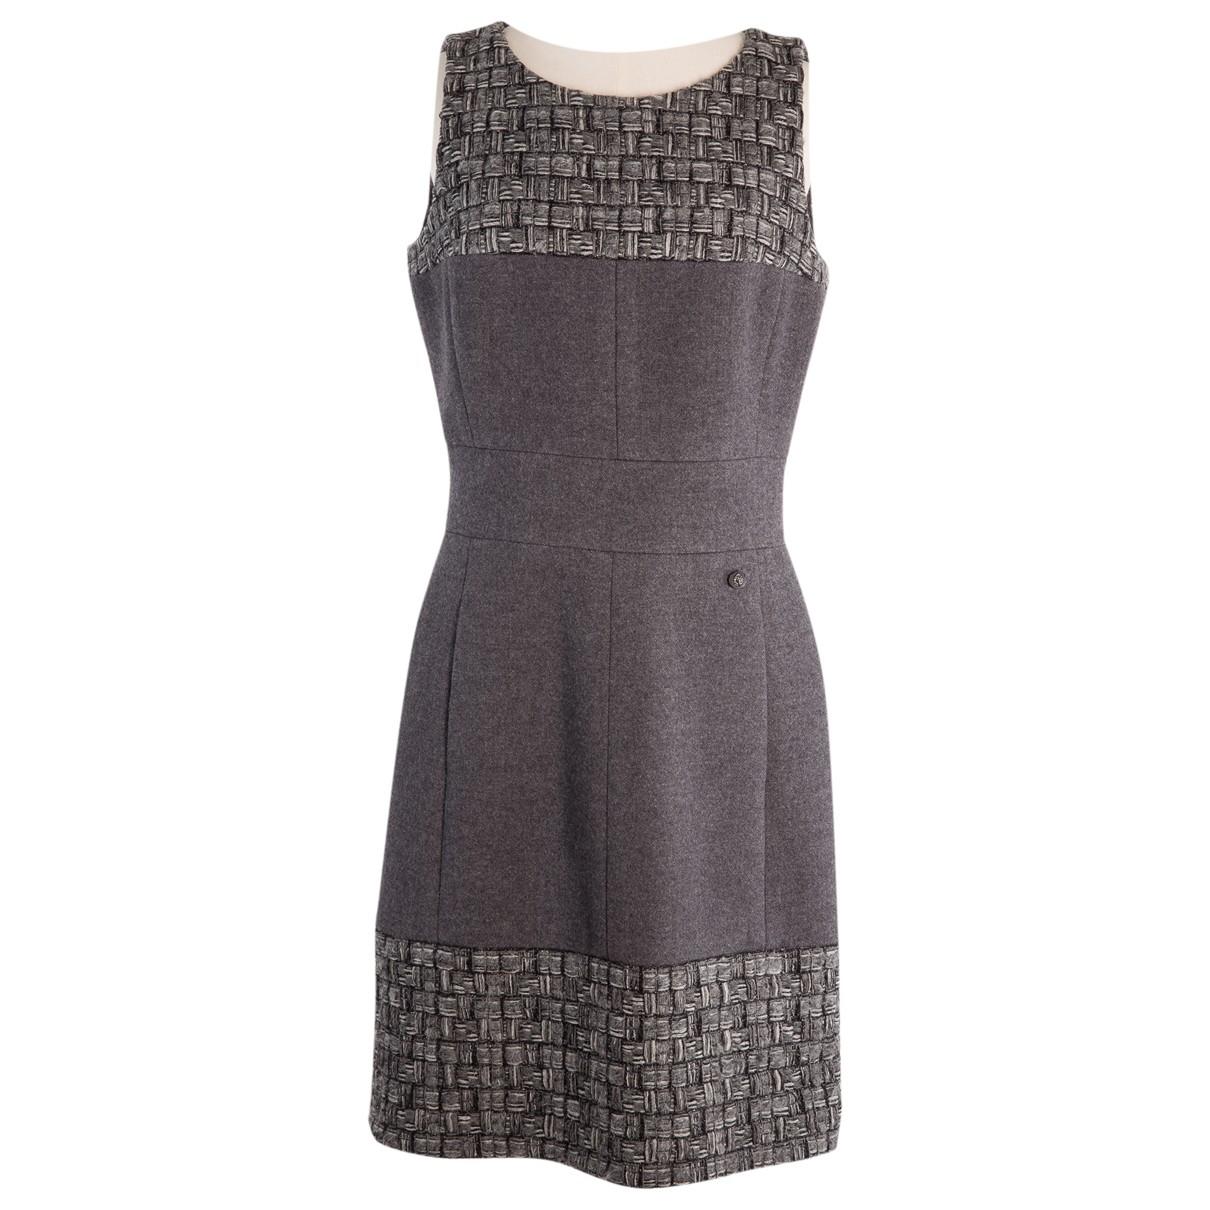 Chanel \N Grey Cashmere dress for Women 36 FR